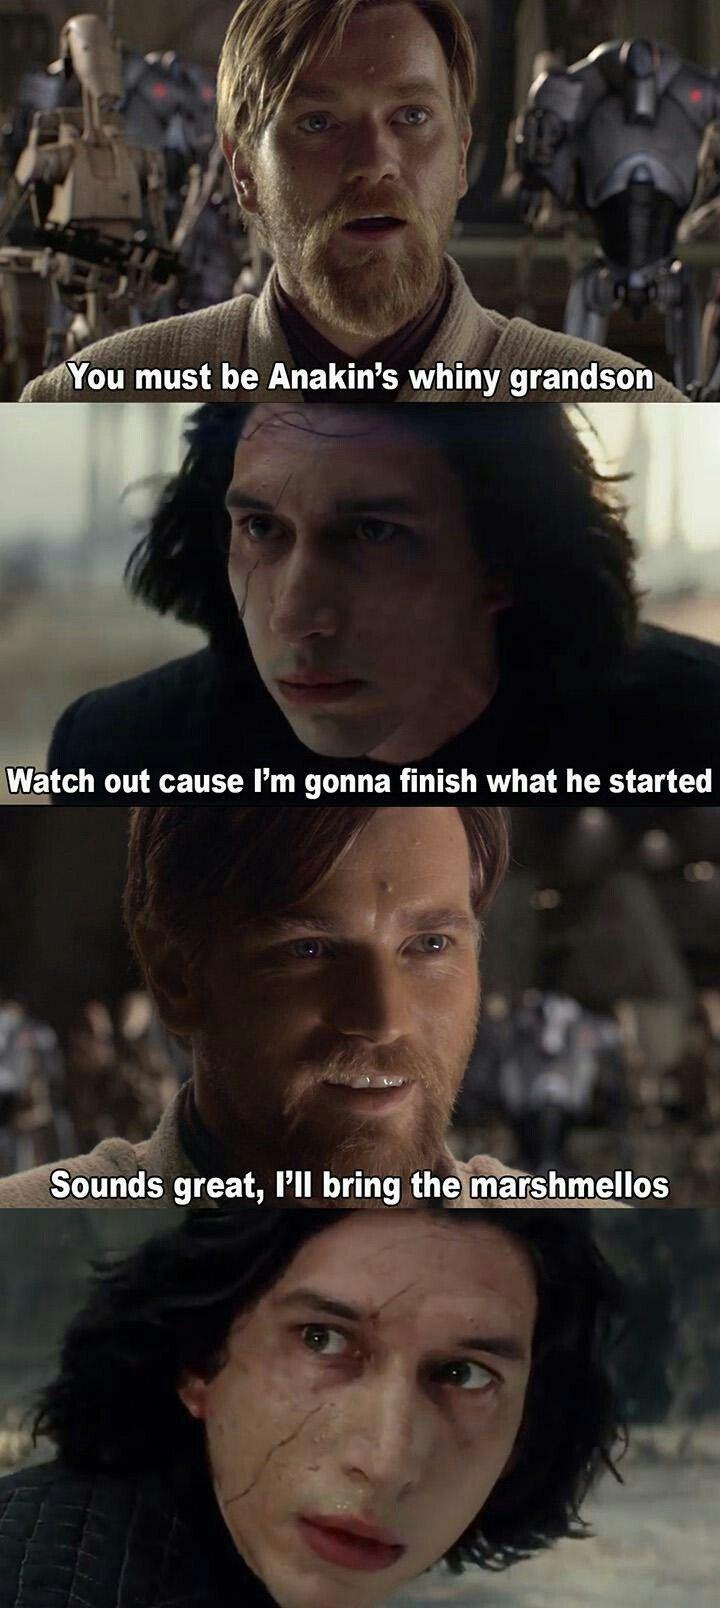 Obi Wan Kenobi And Some Whiny Lil Brat Funny Star Wars Memes Star Wars Memes Star Wars Facts